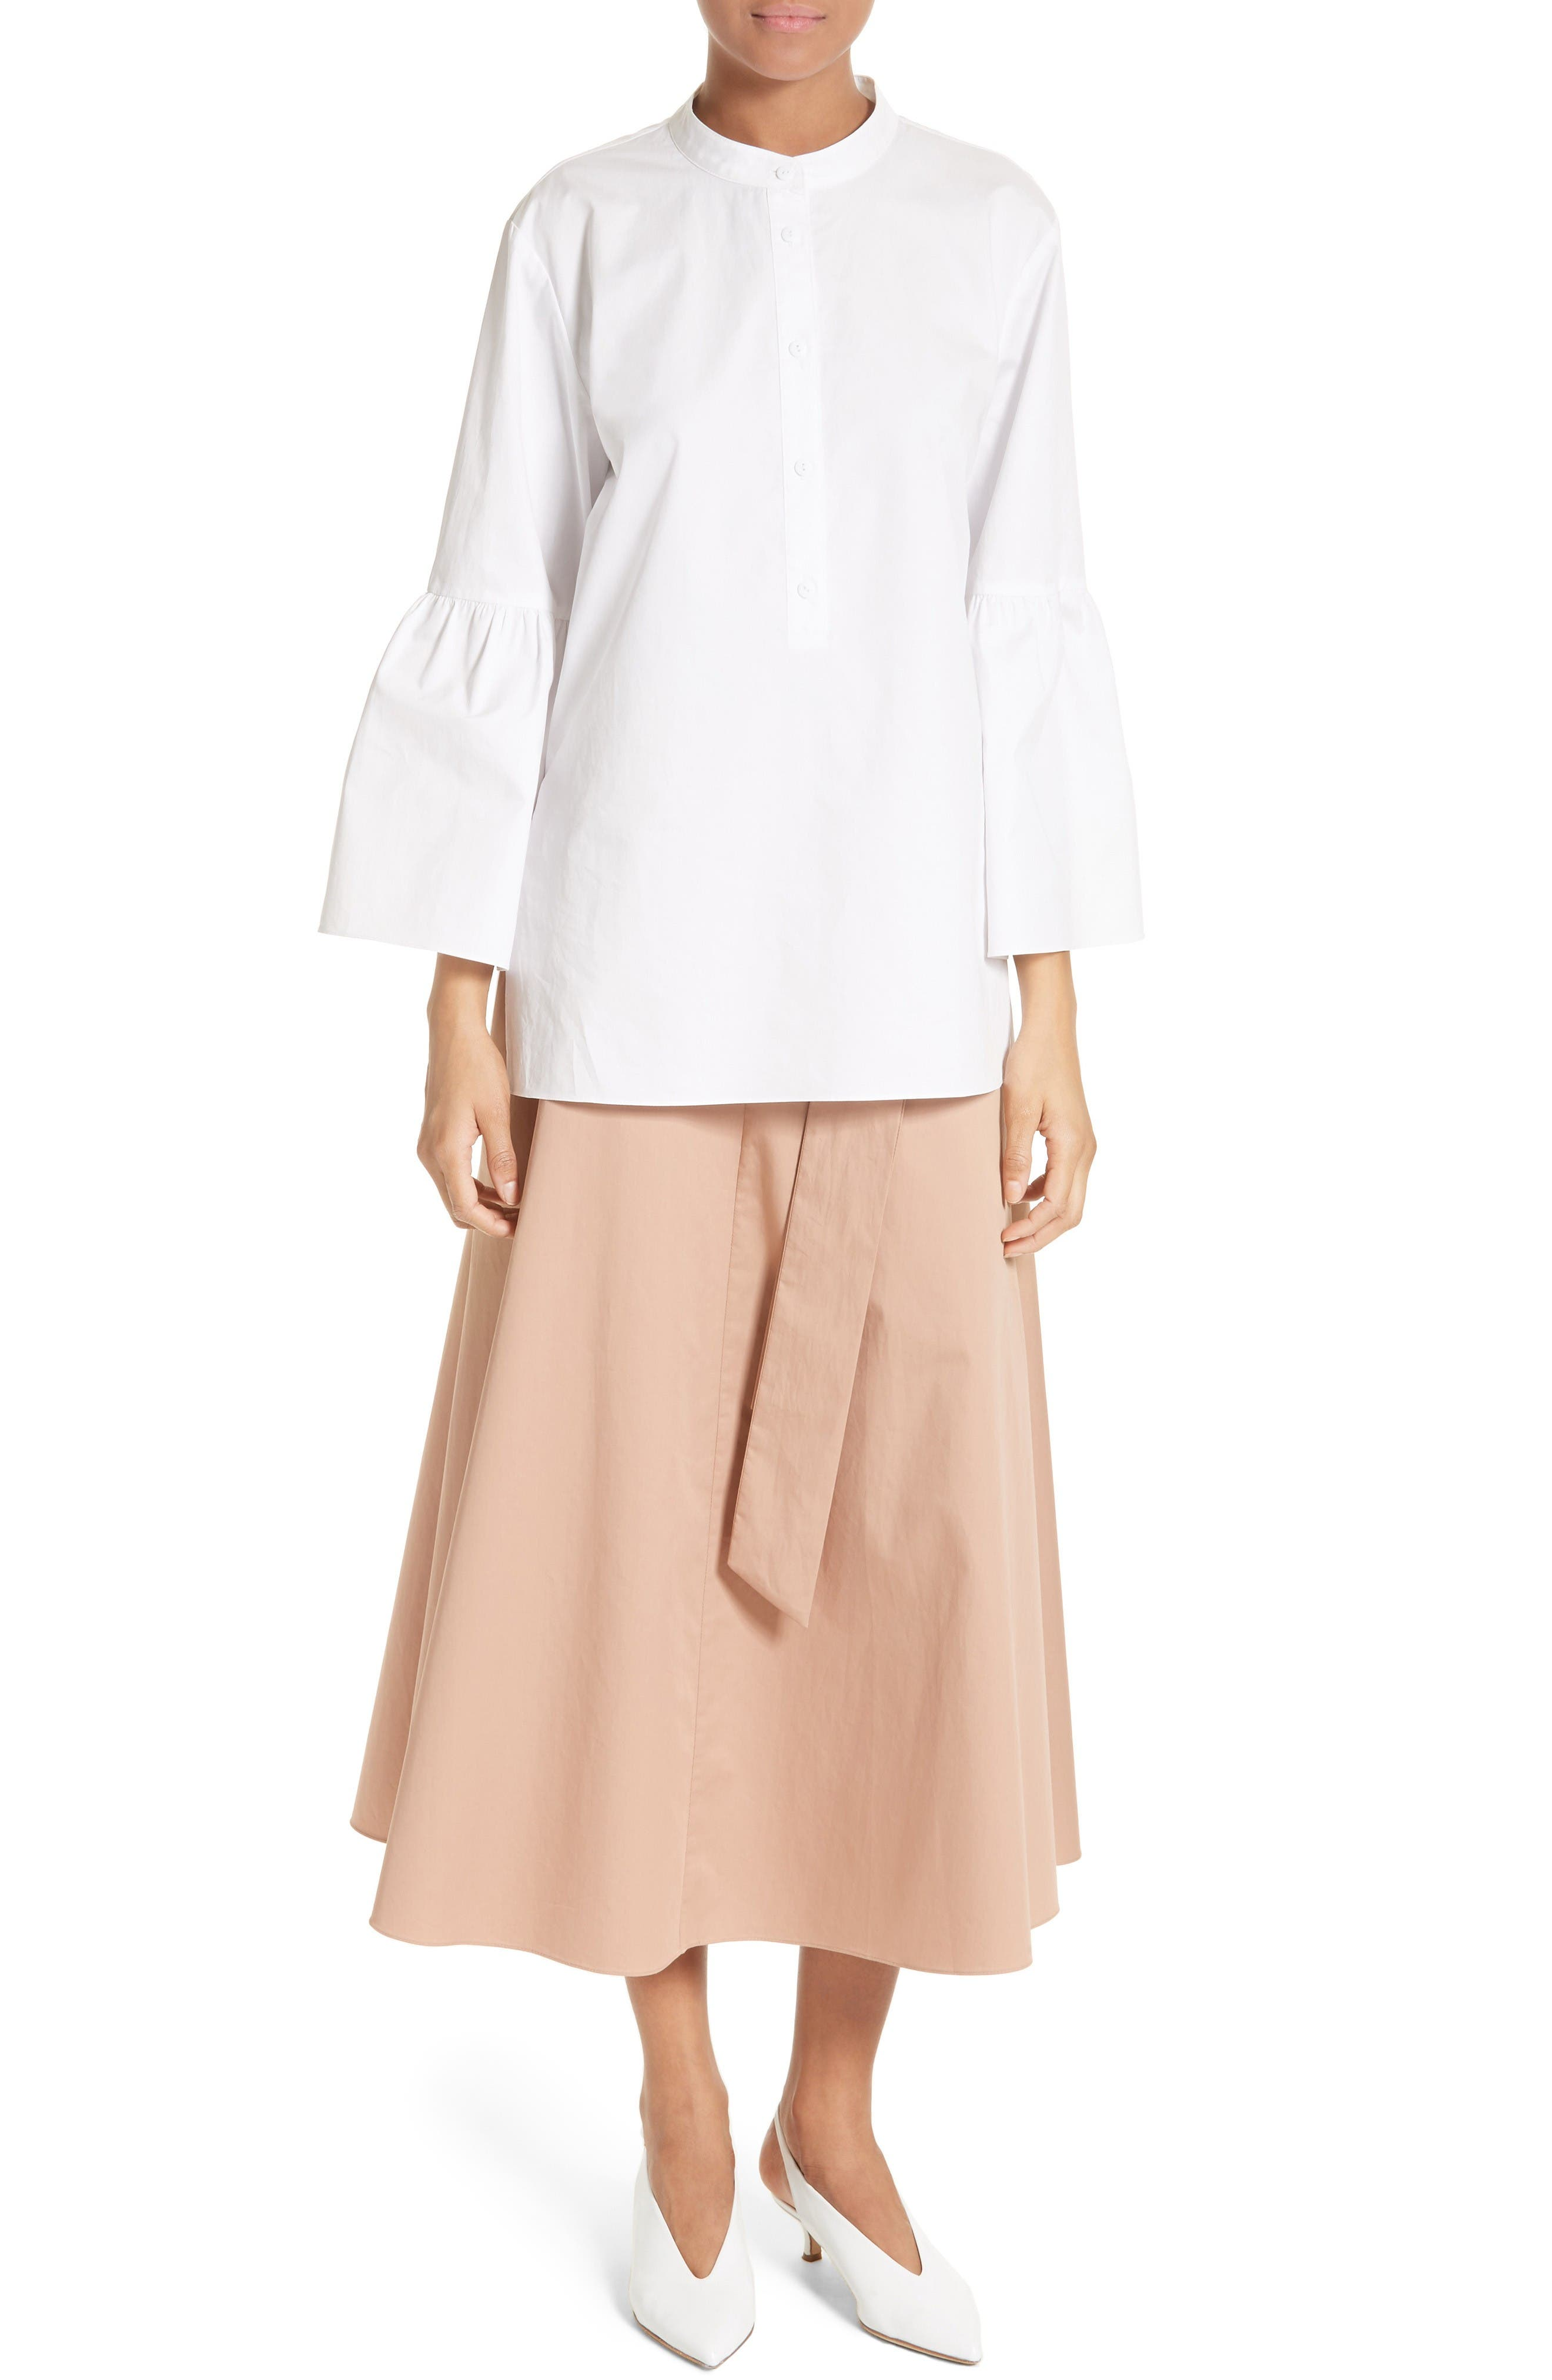 Shirred Satin Poplin Shirt,                             Alternate thumbnail 2, color,                             White